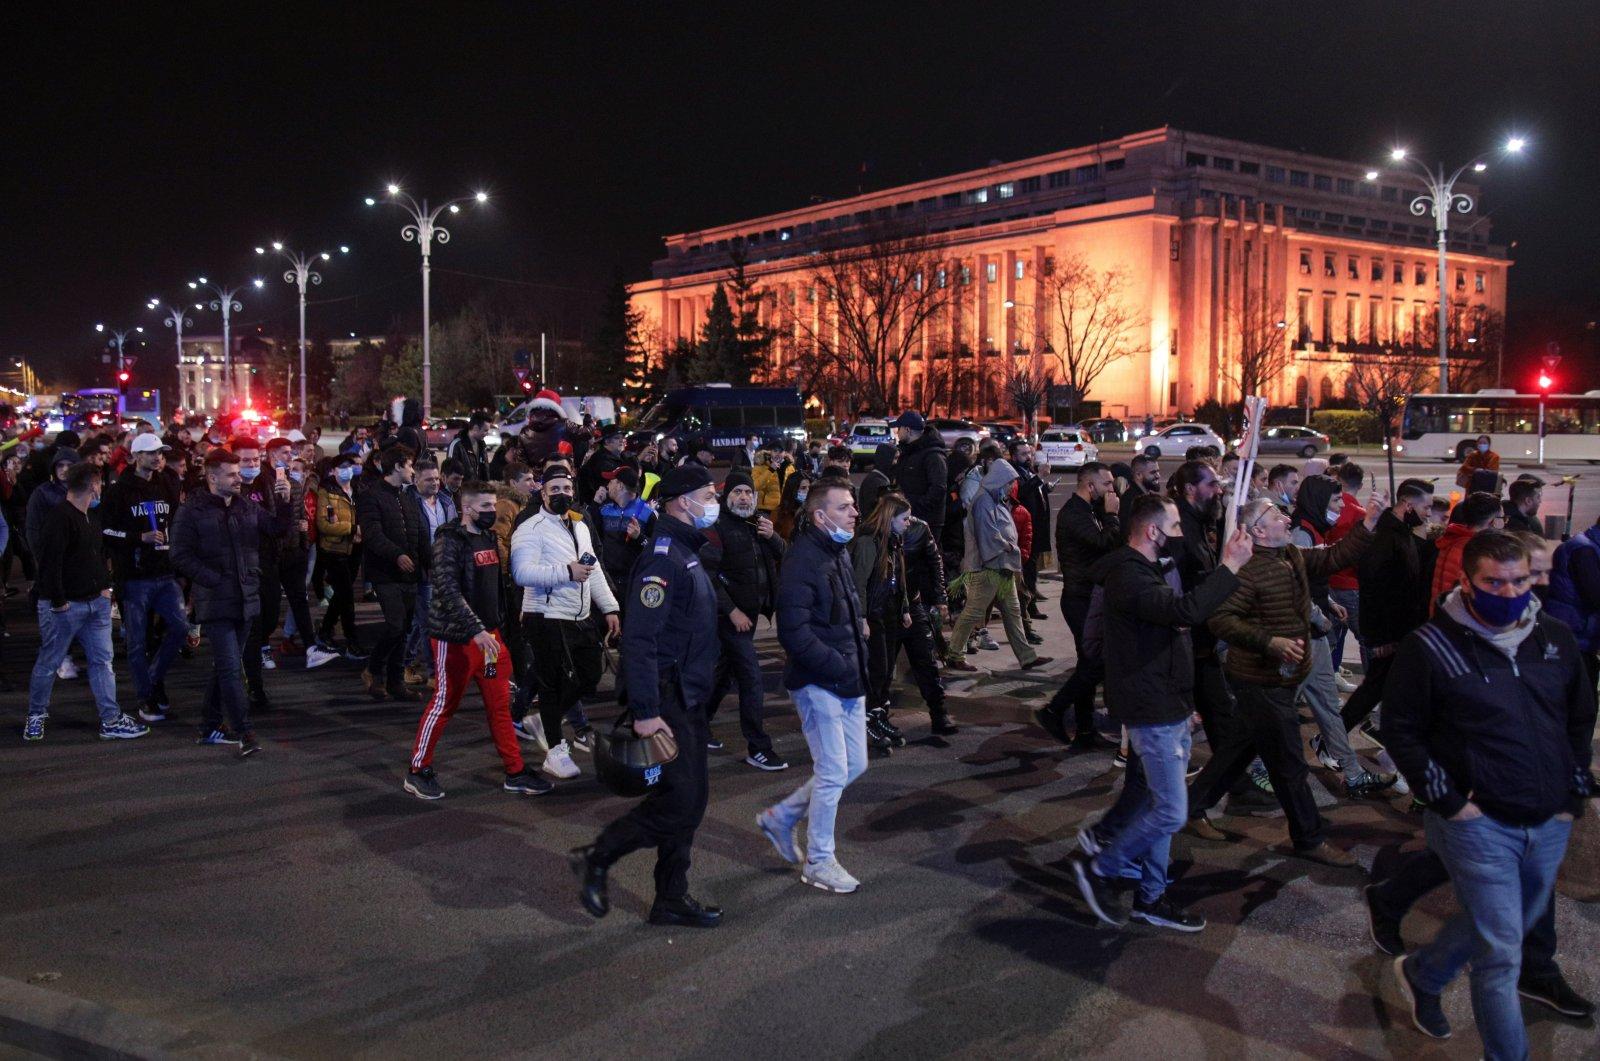 People march demanding an end to coronavirus restrictions, in Bucharest, Romania, March 30, 2021. (Inquam Photos / Octav Ganea via Reuters)